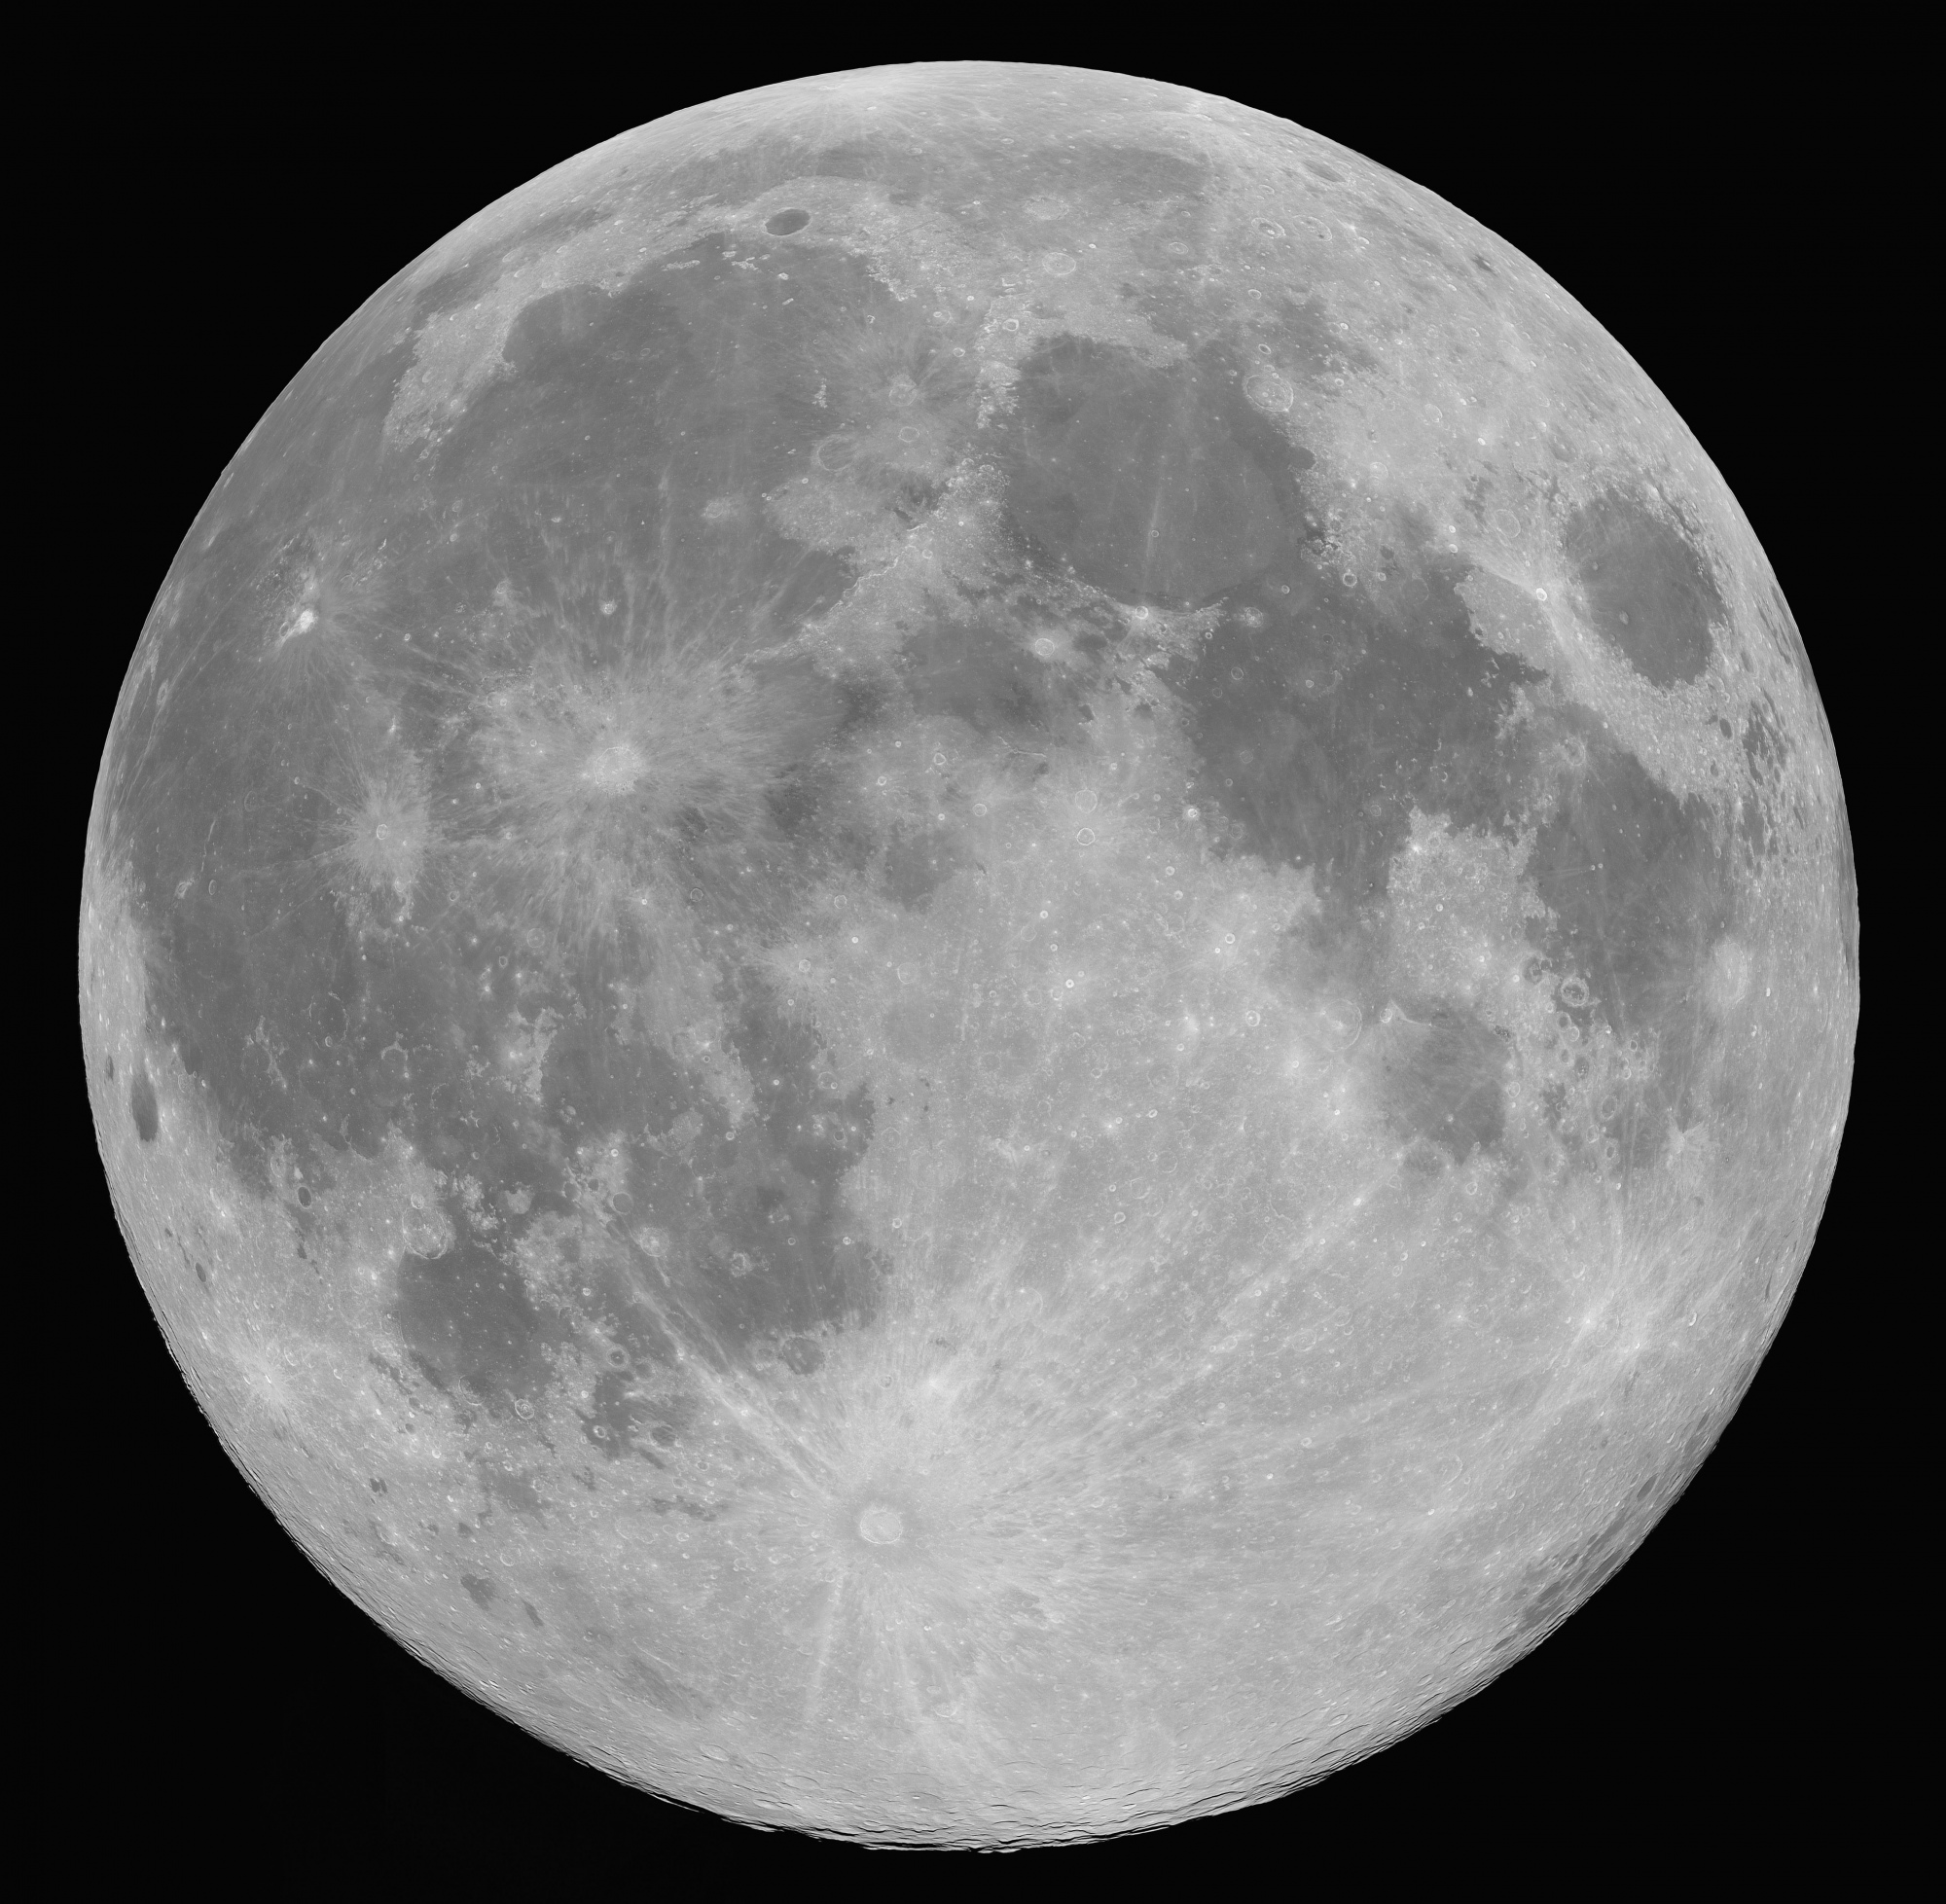 lune_astro.thumb.jpg.0fe4700bc151c7d743fd4820df627096.jpg